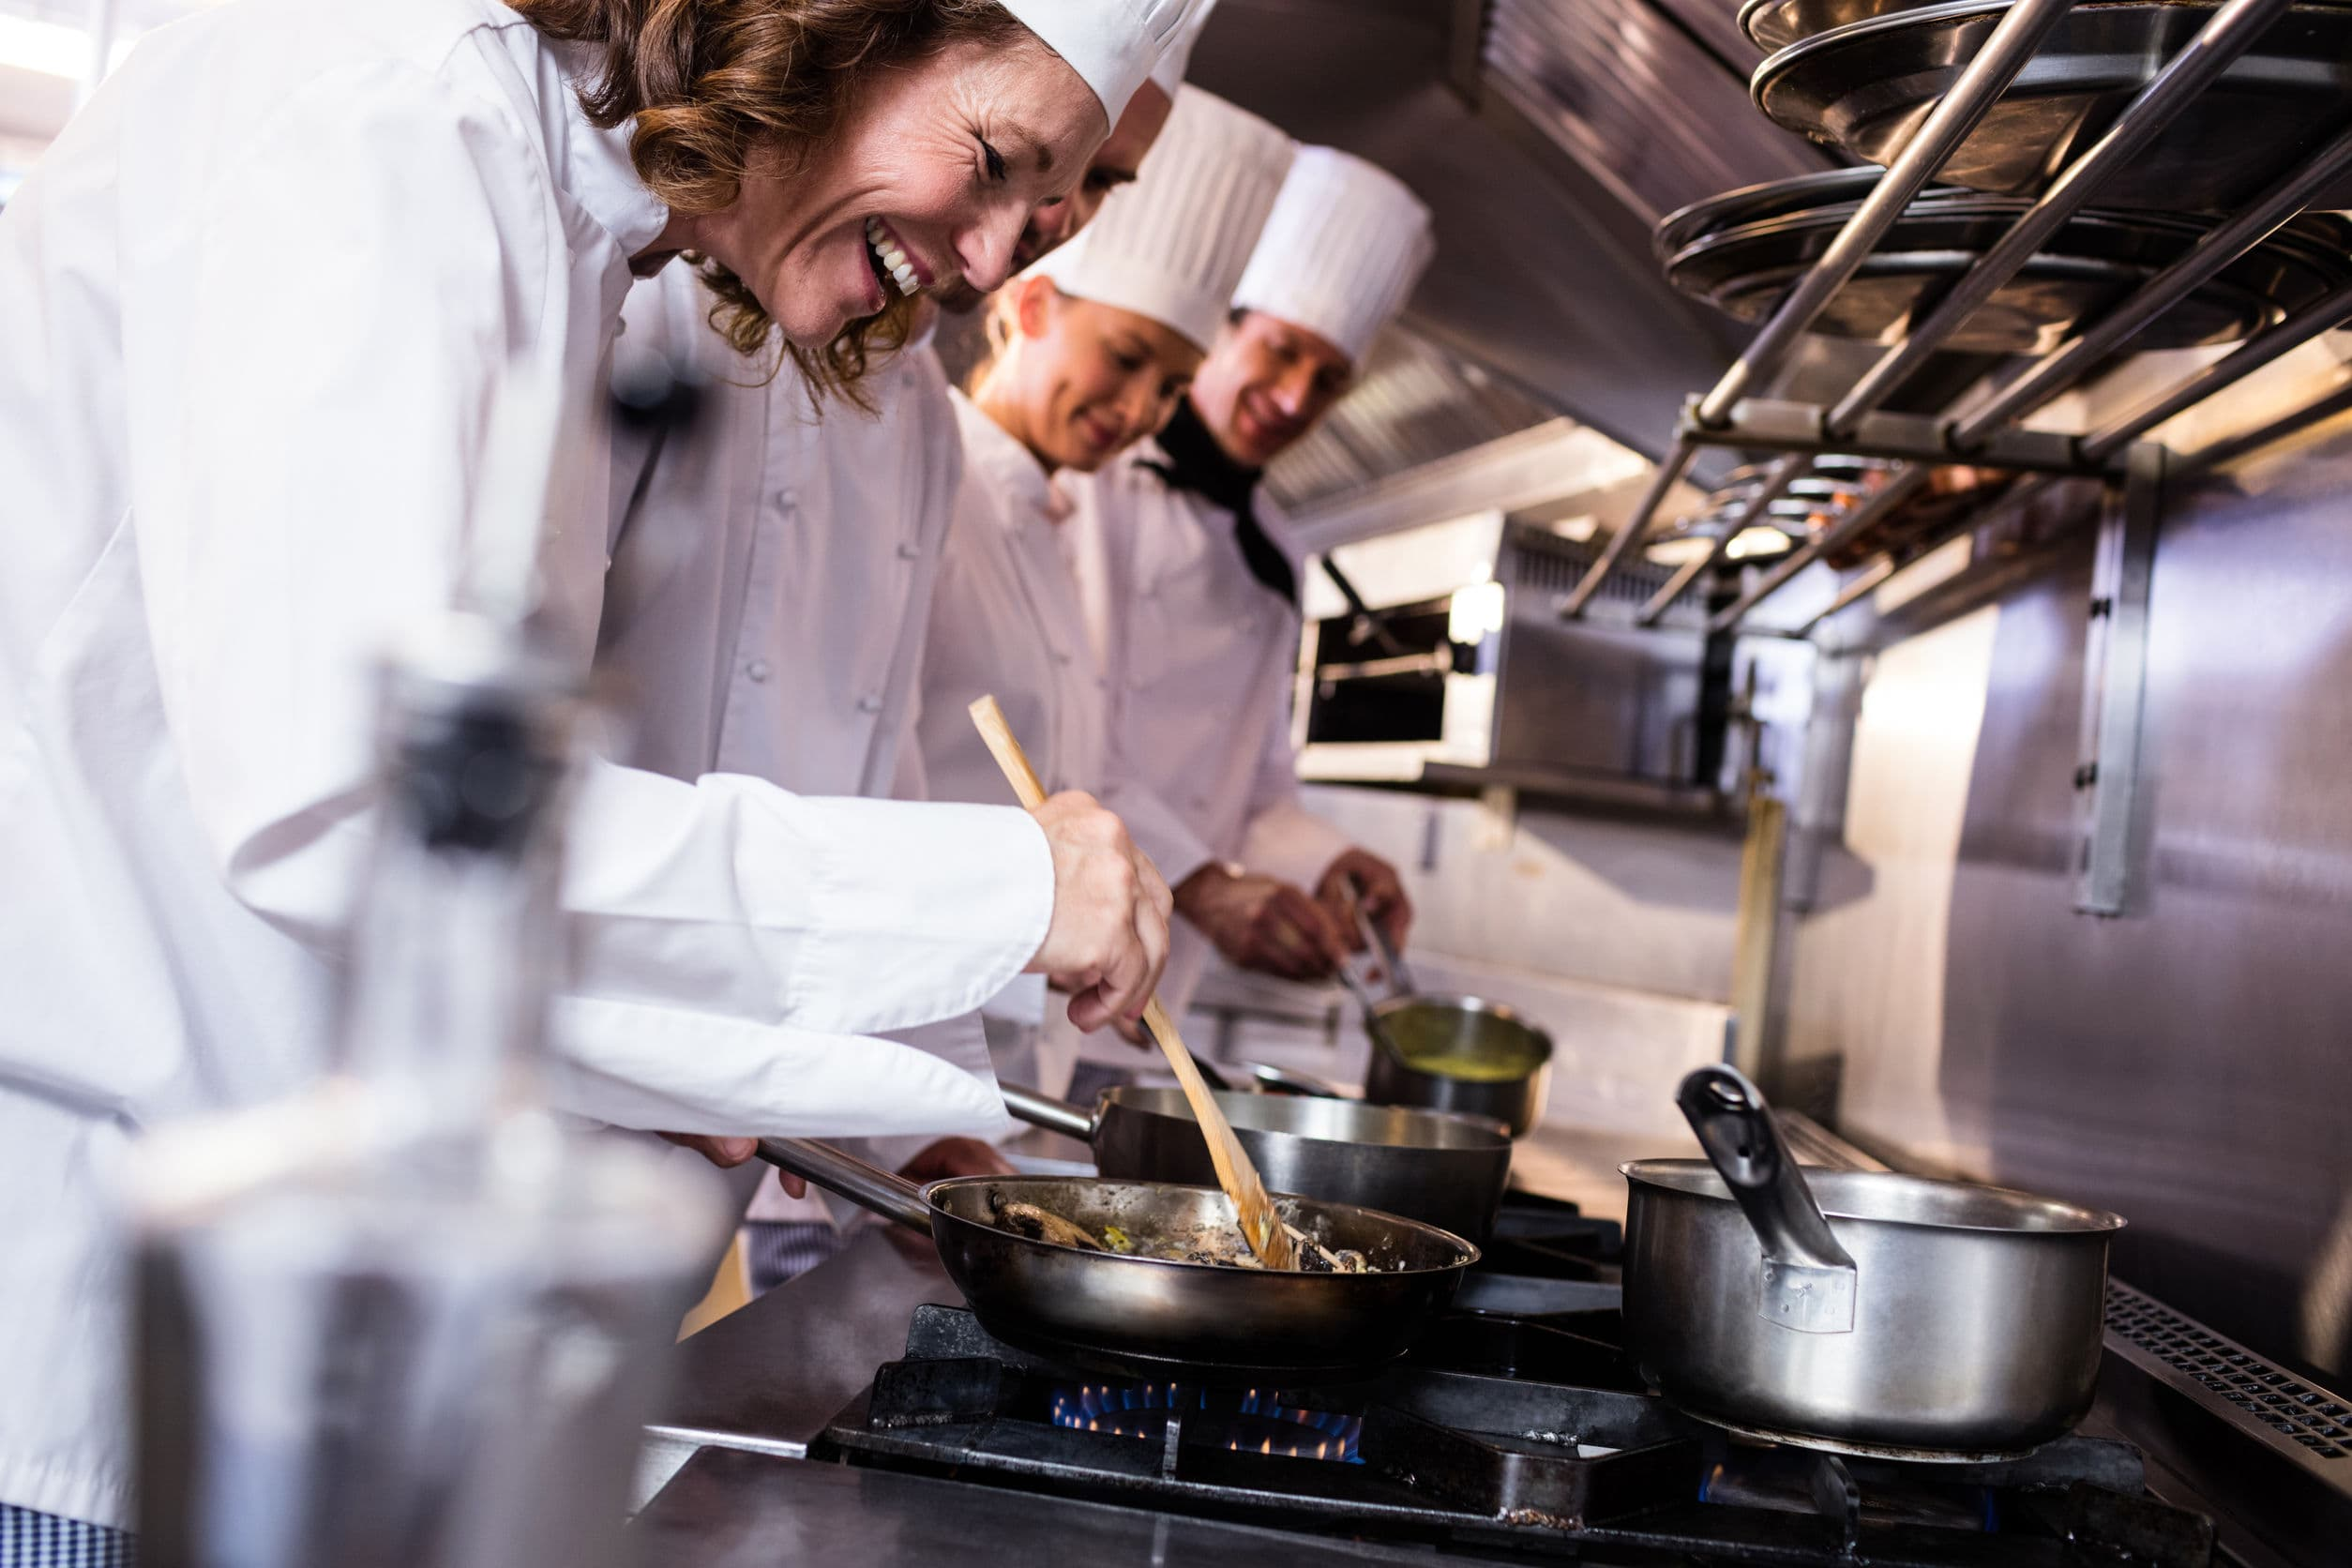 New Restaurant Equipment In 2012